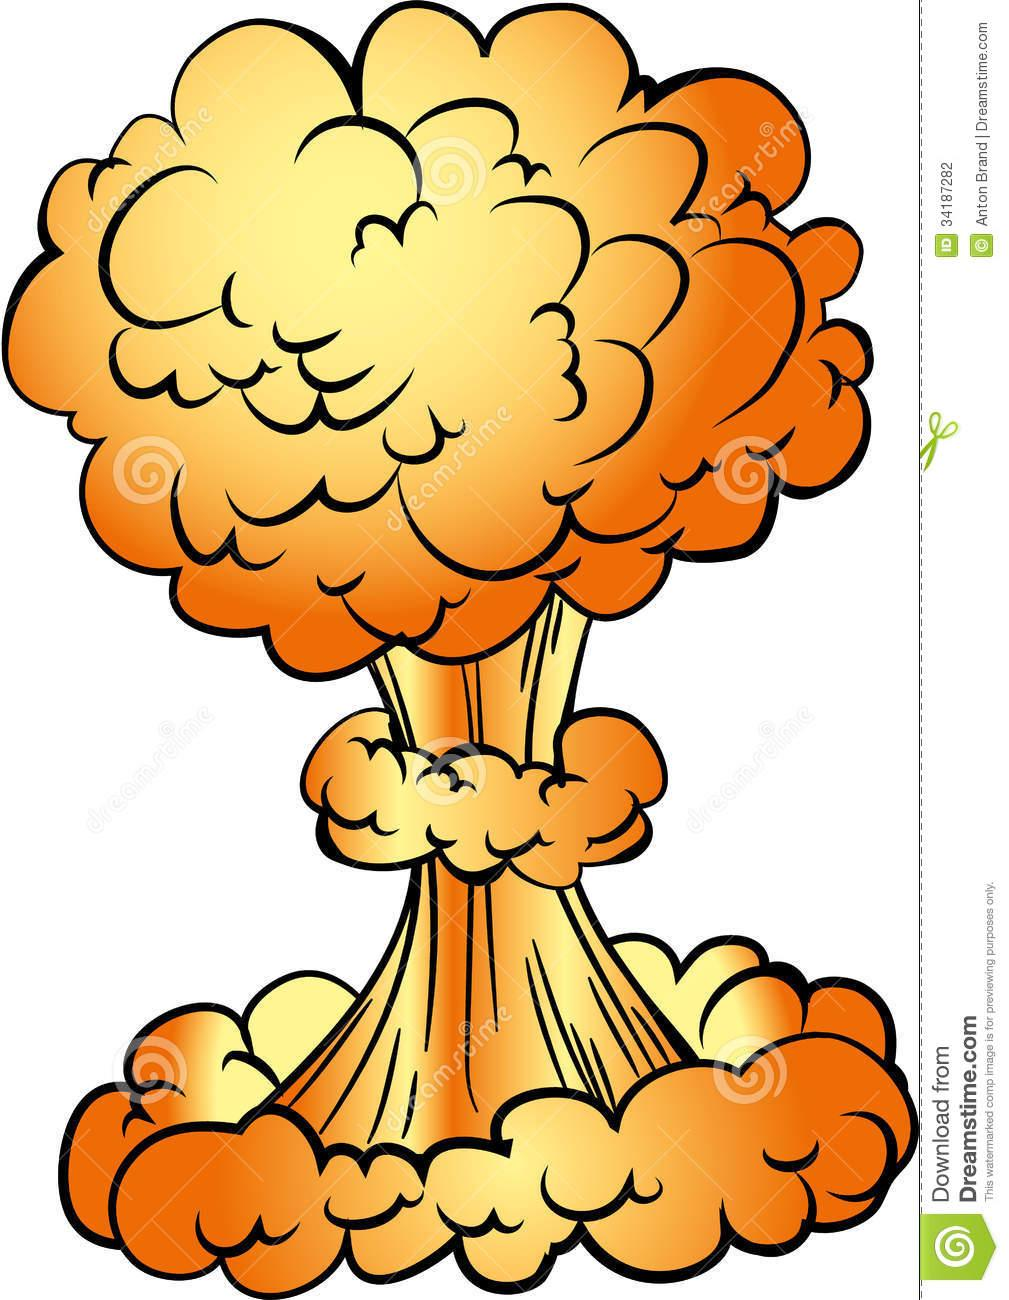 Ordnance bomb clip art.